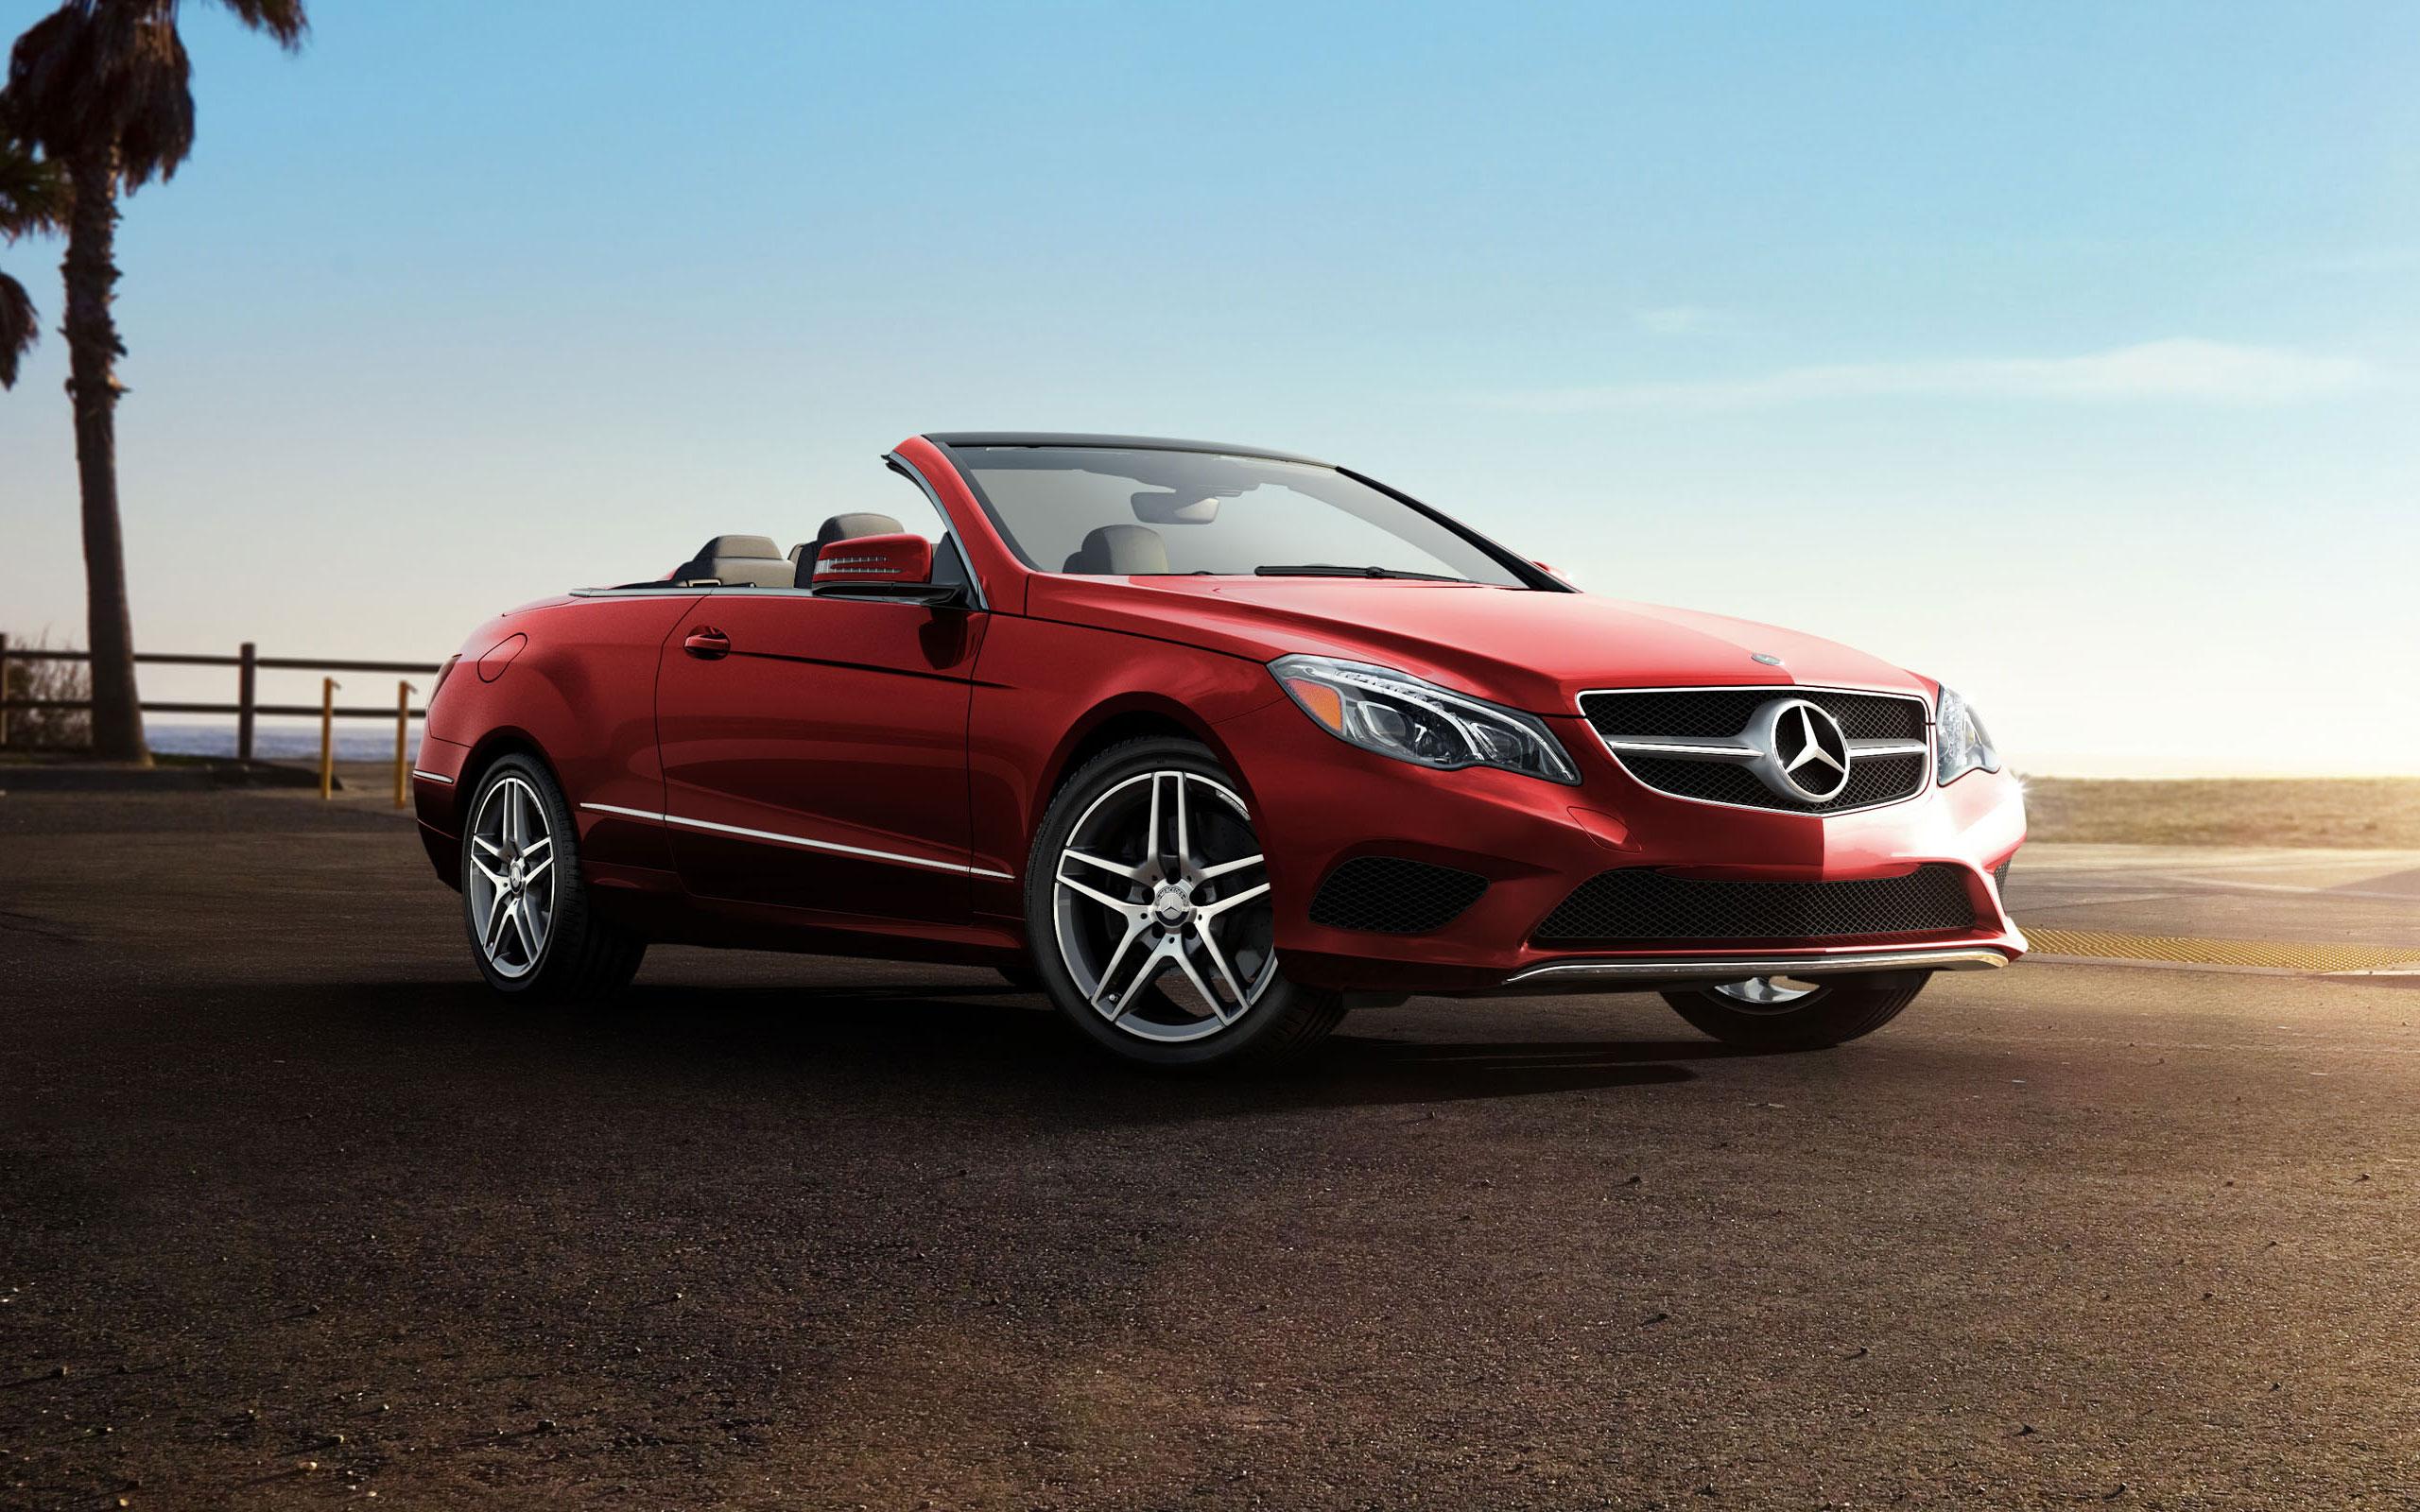 Gallery: 2016 Mercedes-Maybach S600 Photos | The News Wheel